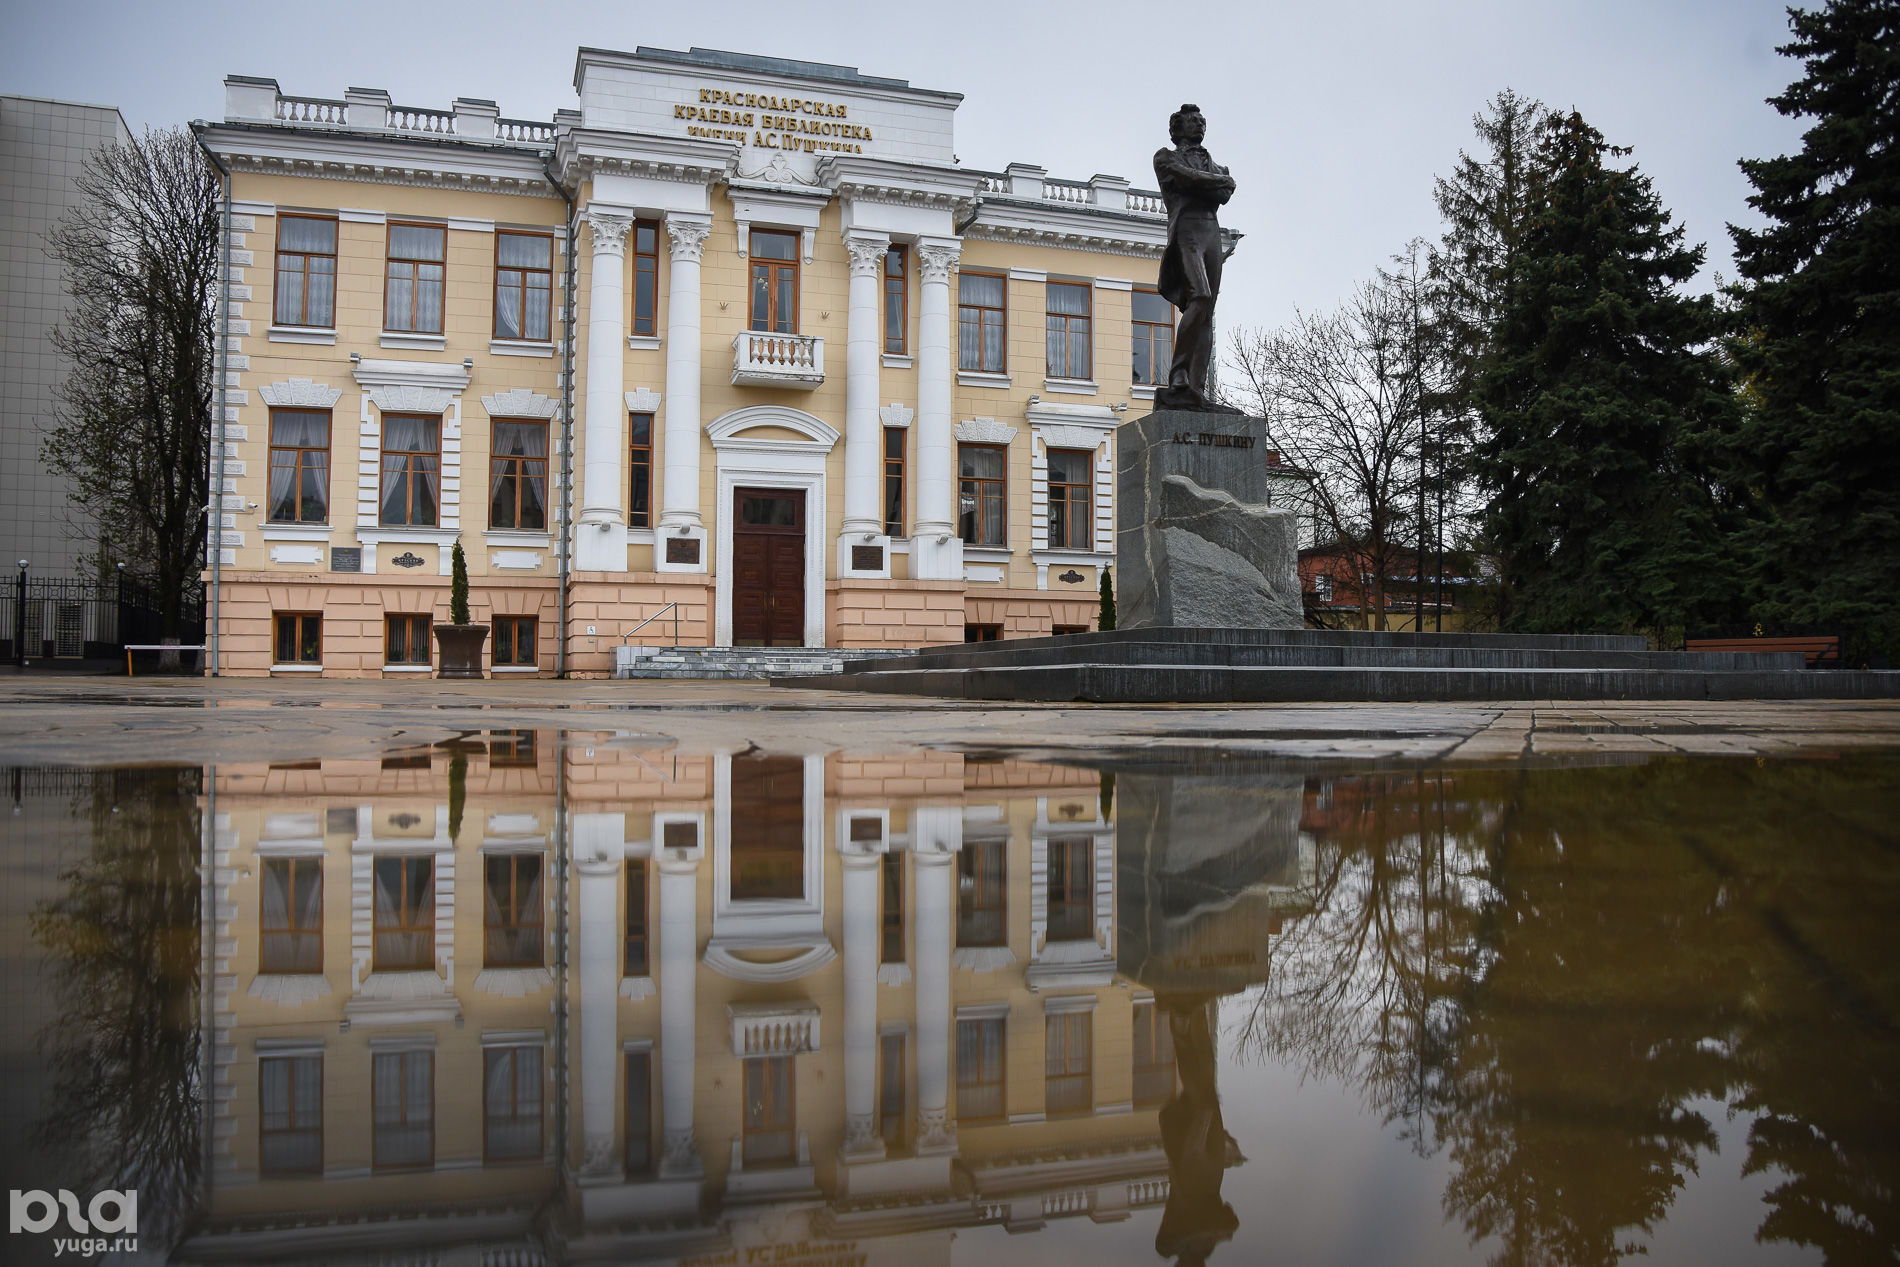 Библиотека имени Пушкина ©Фото Елены Синеок, Юга.ру